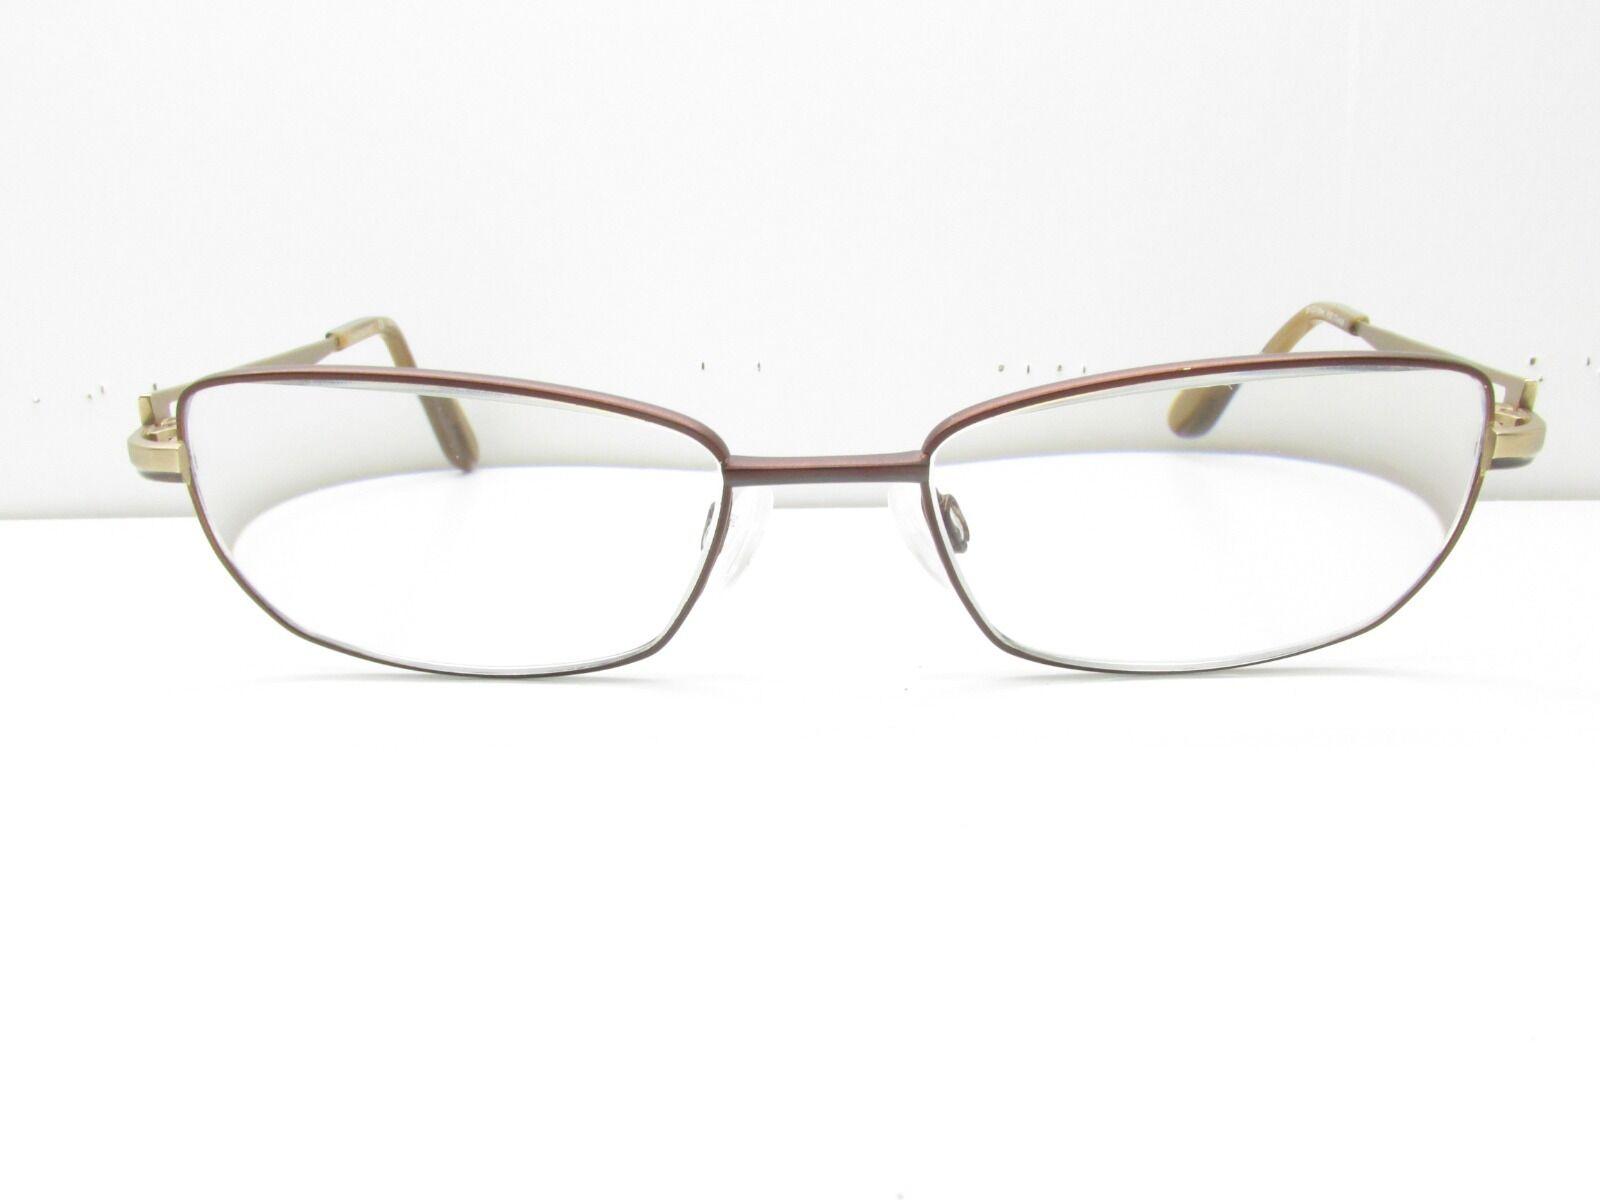 Charmant CH10891 Eyewear Frames 50-17-135 Brown Rectangle Tv0 32089 ...